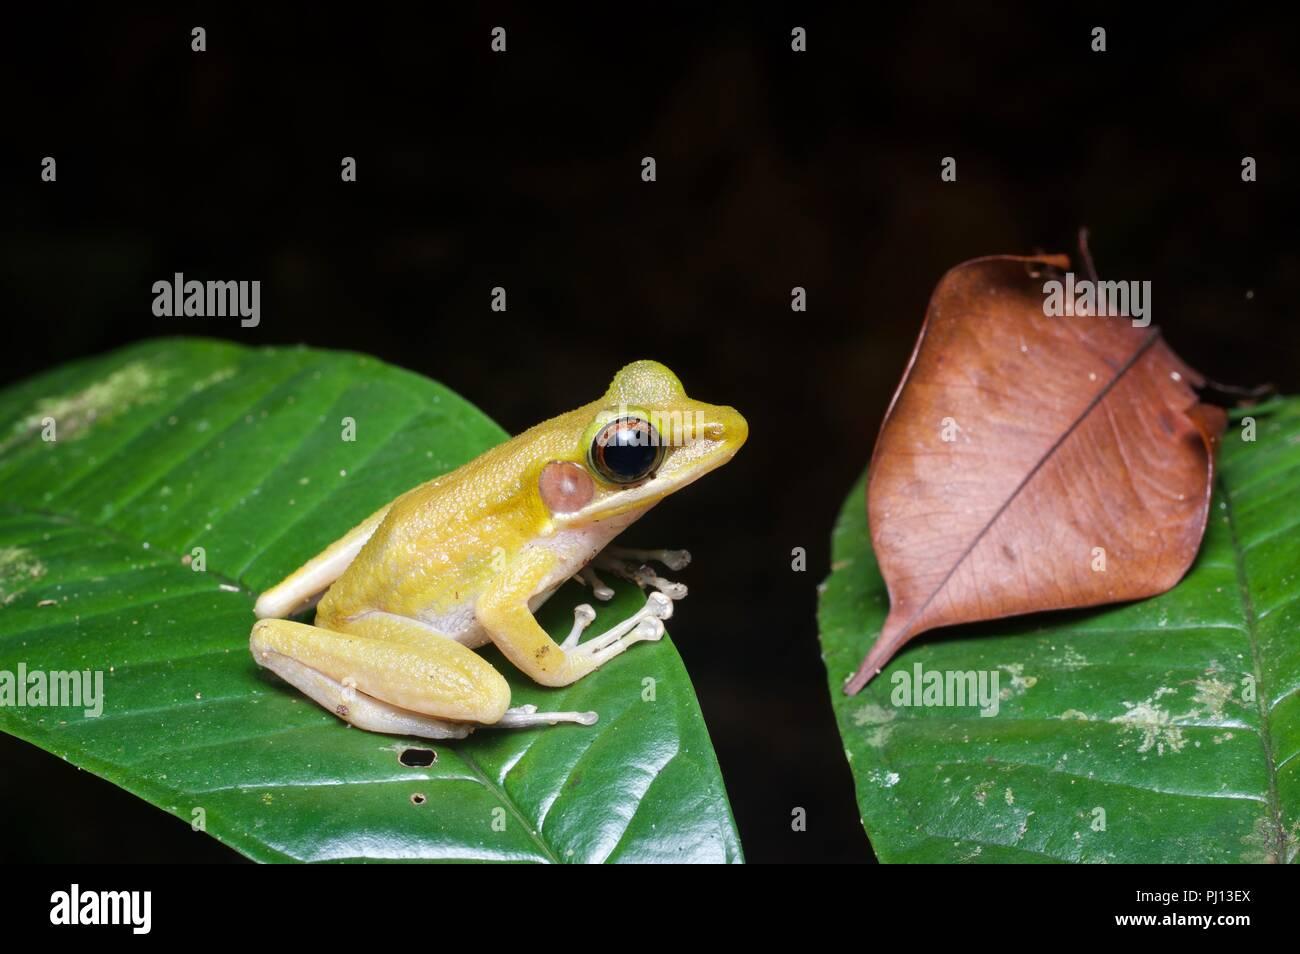 A Jade-backed Stream Frog (Hylarana raniceps) on a leaf at night in Kubah National Park, Sarawak, East Malaysia, Borneo - Stock Image